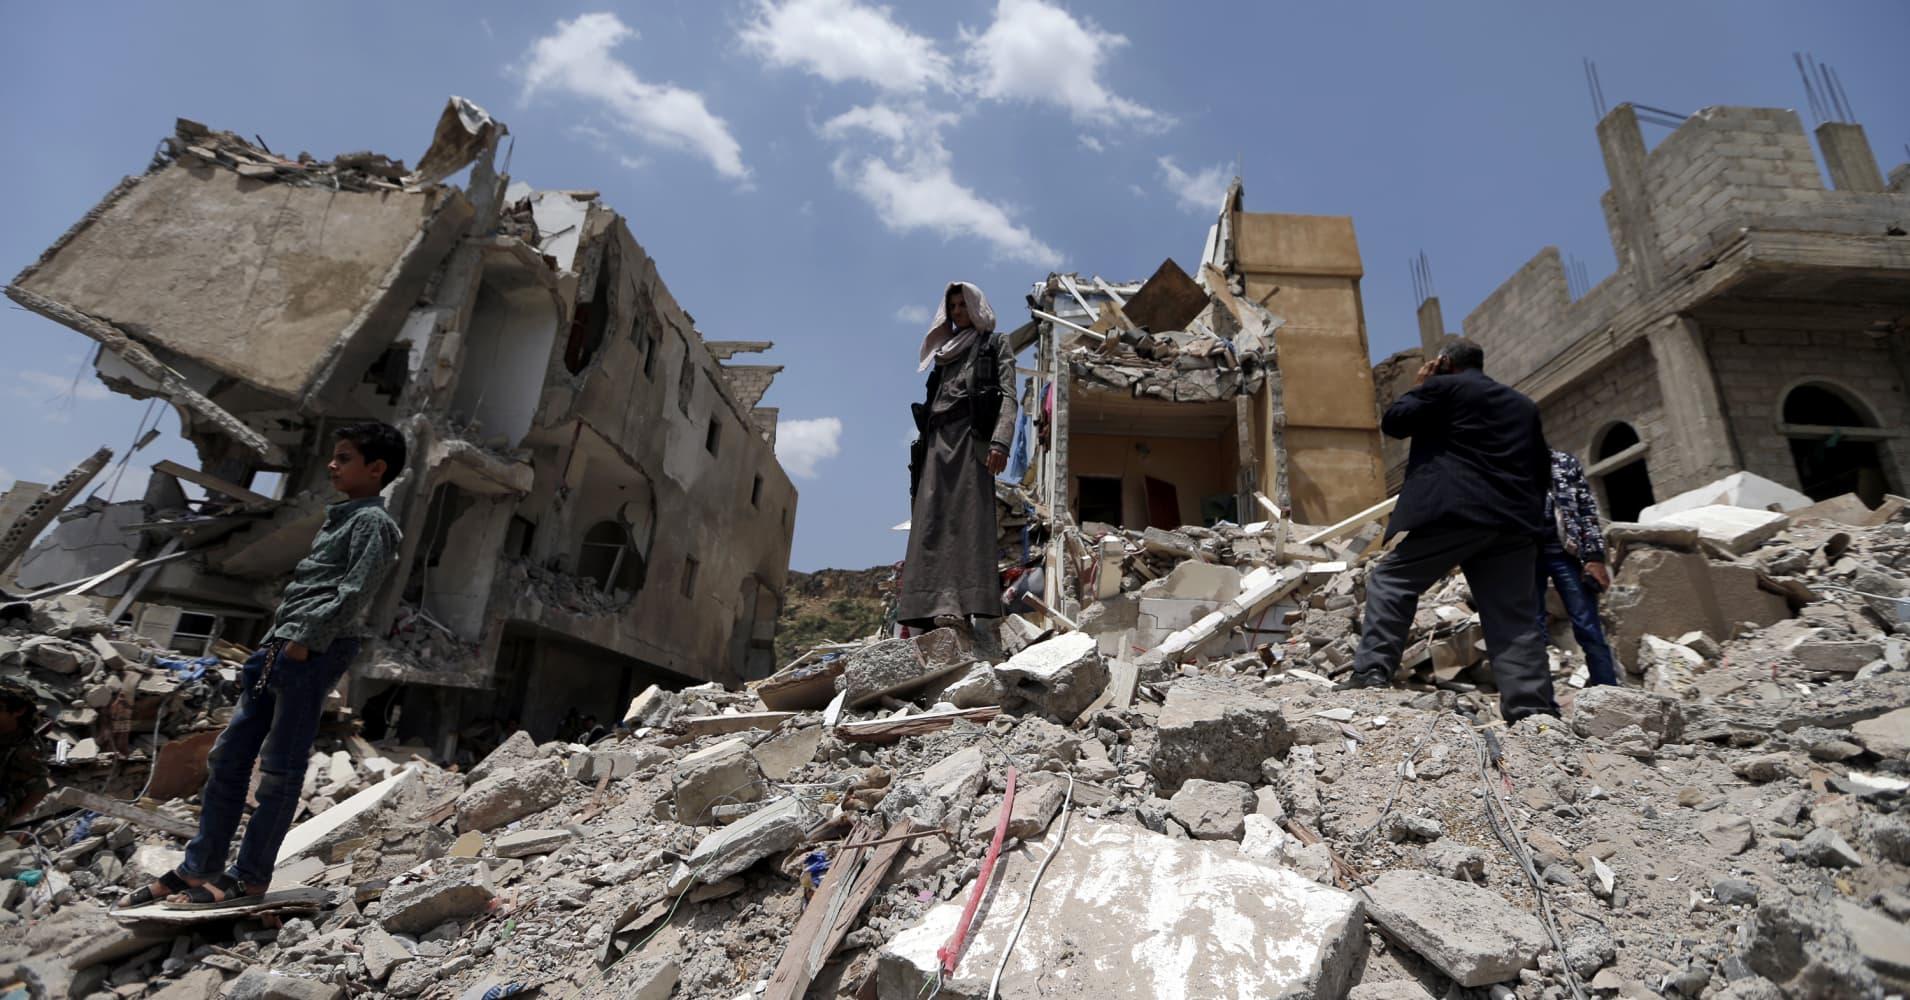 Saudi Arabia and UAE announce $500 million aid programme for Yemen